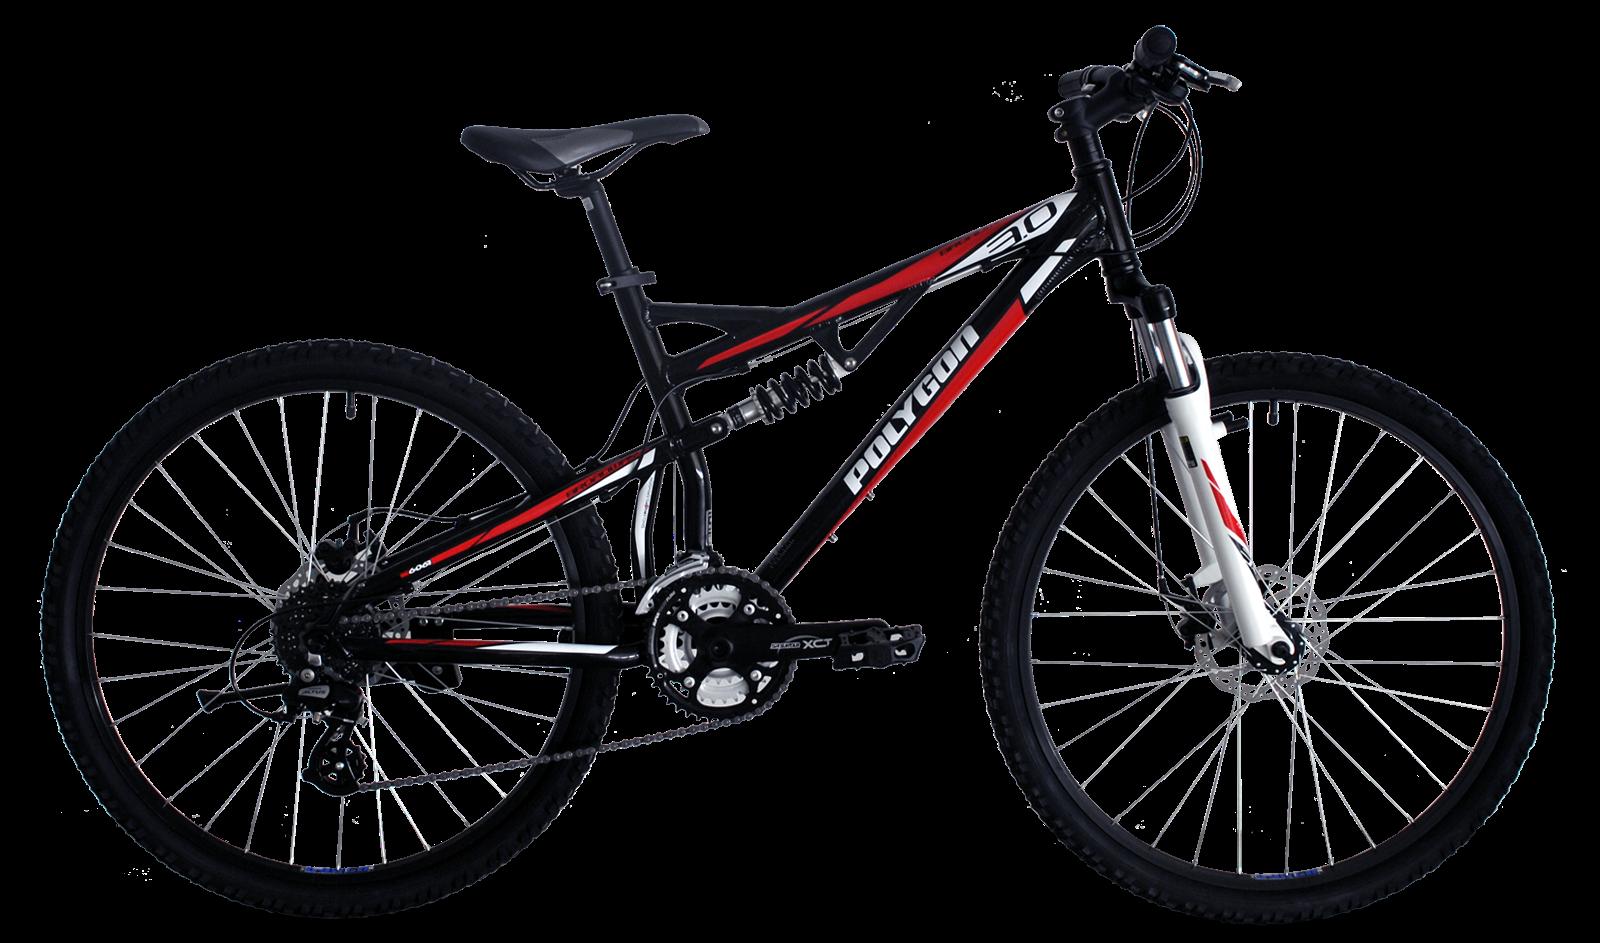 FIA BIKE Sepeda Gunung Polygon BROADWAY 30 Series 2013